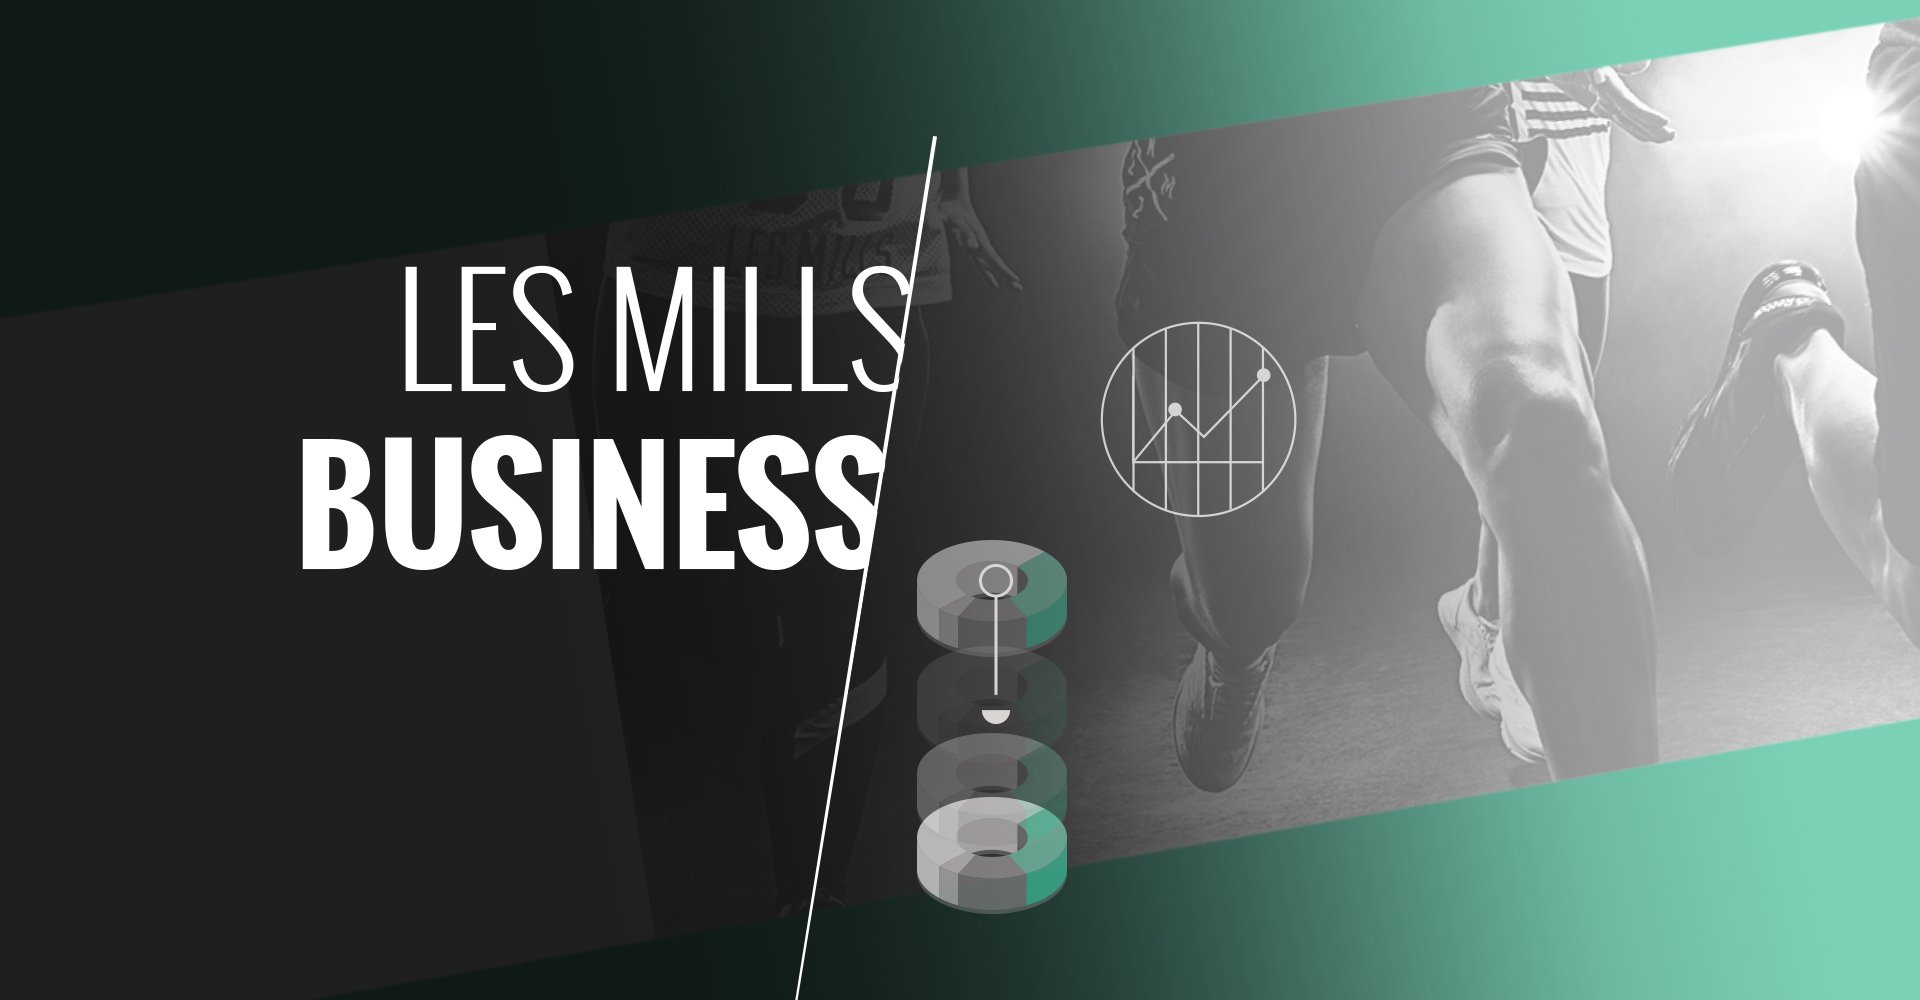 LES MILLS Business